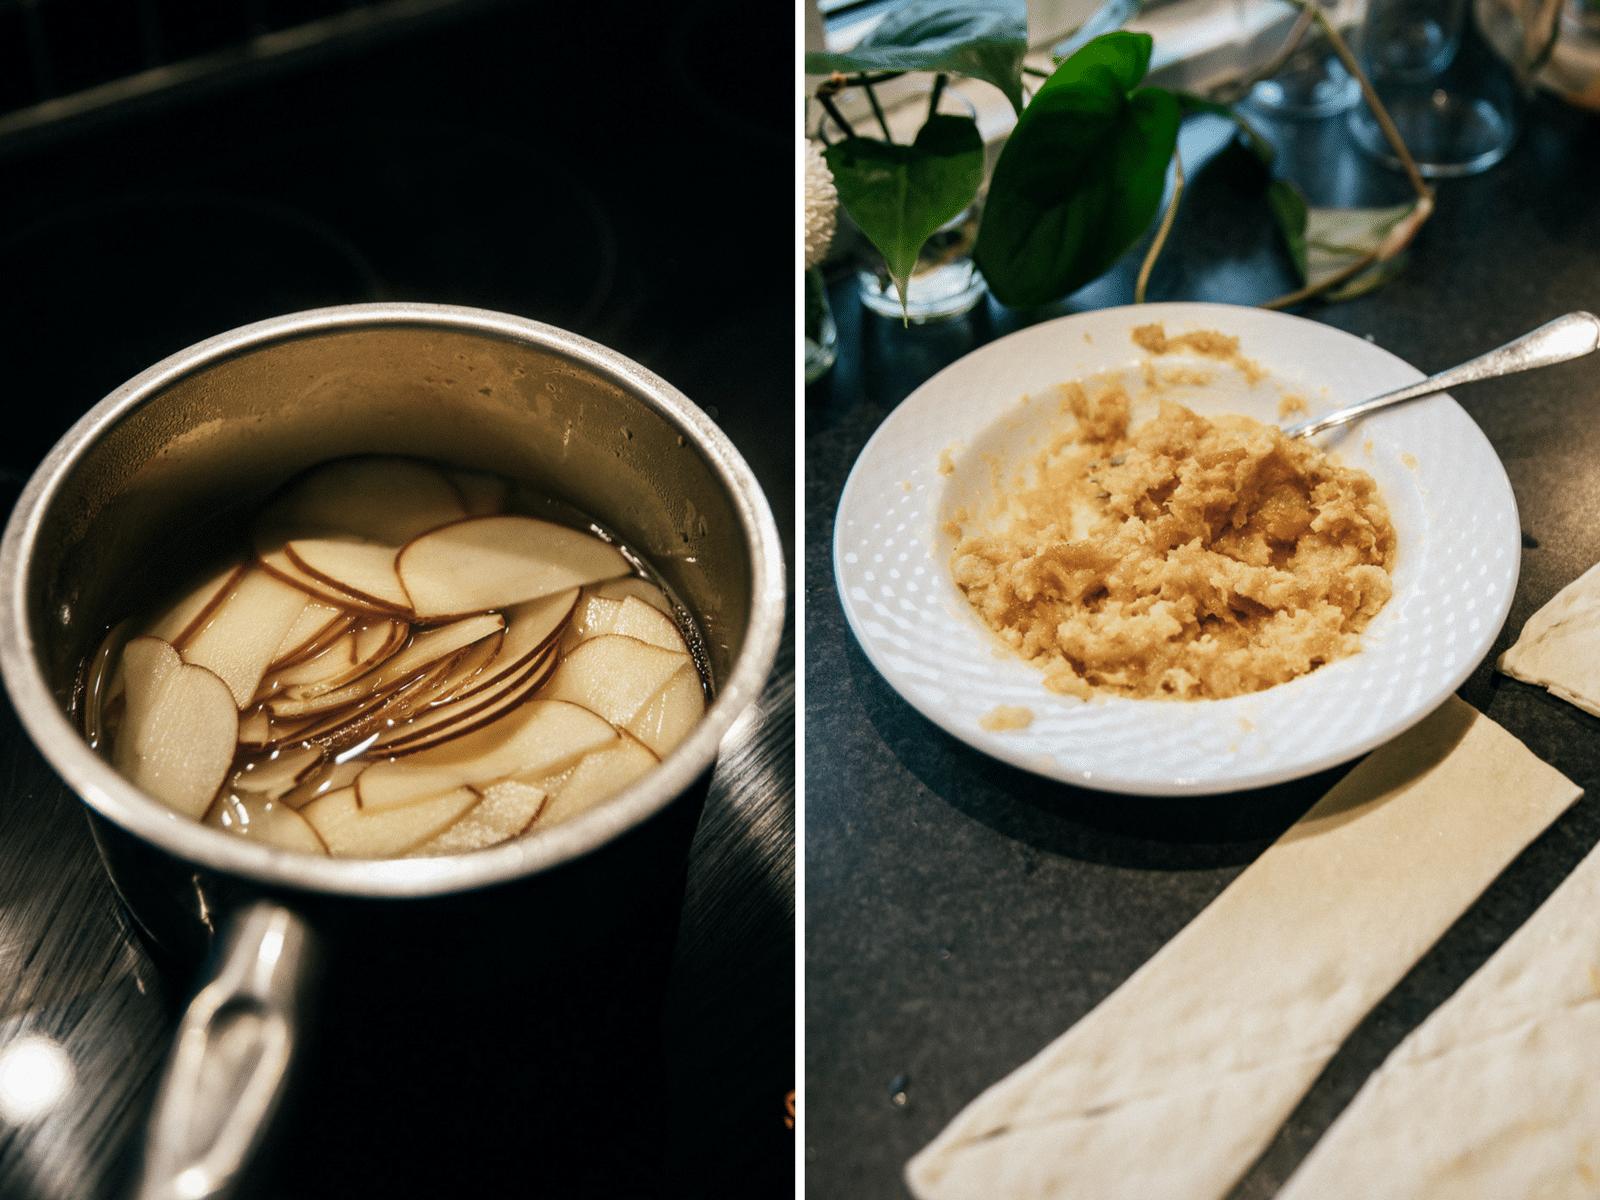 danerolles, kaffe, nemme kager, nem croissant opskrift